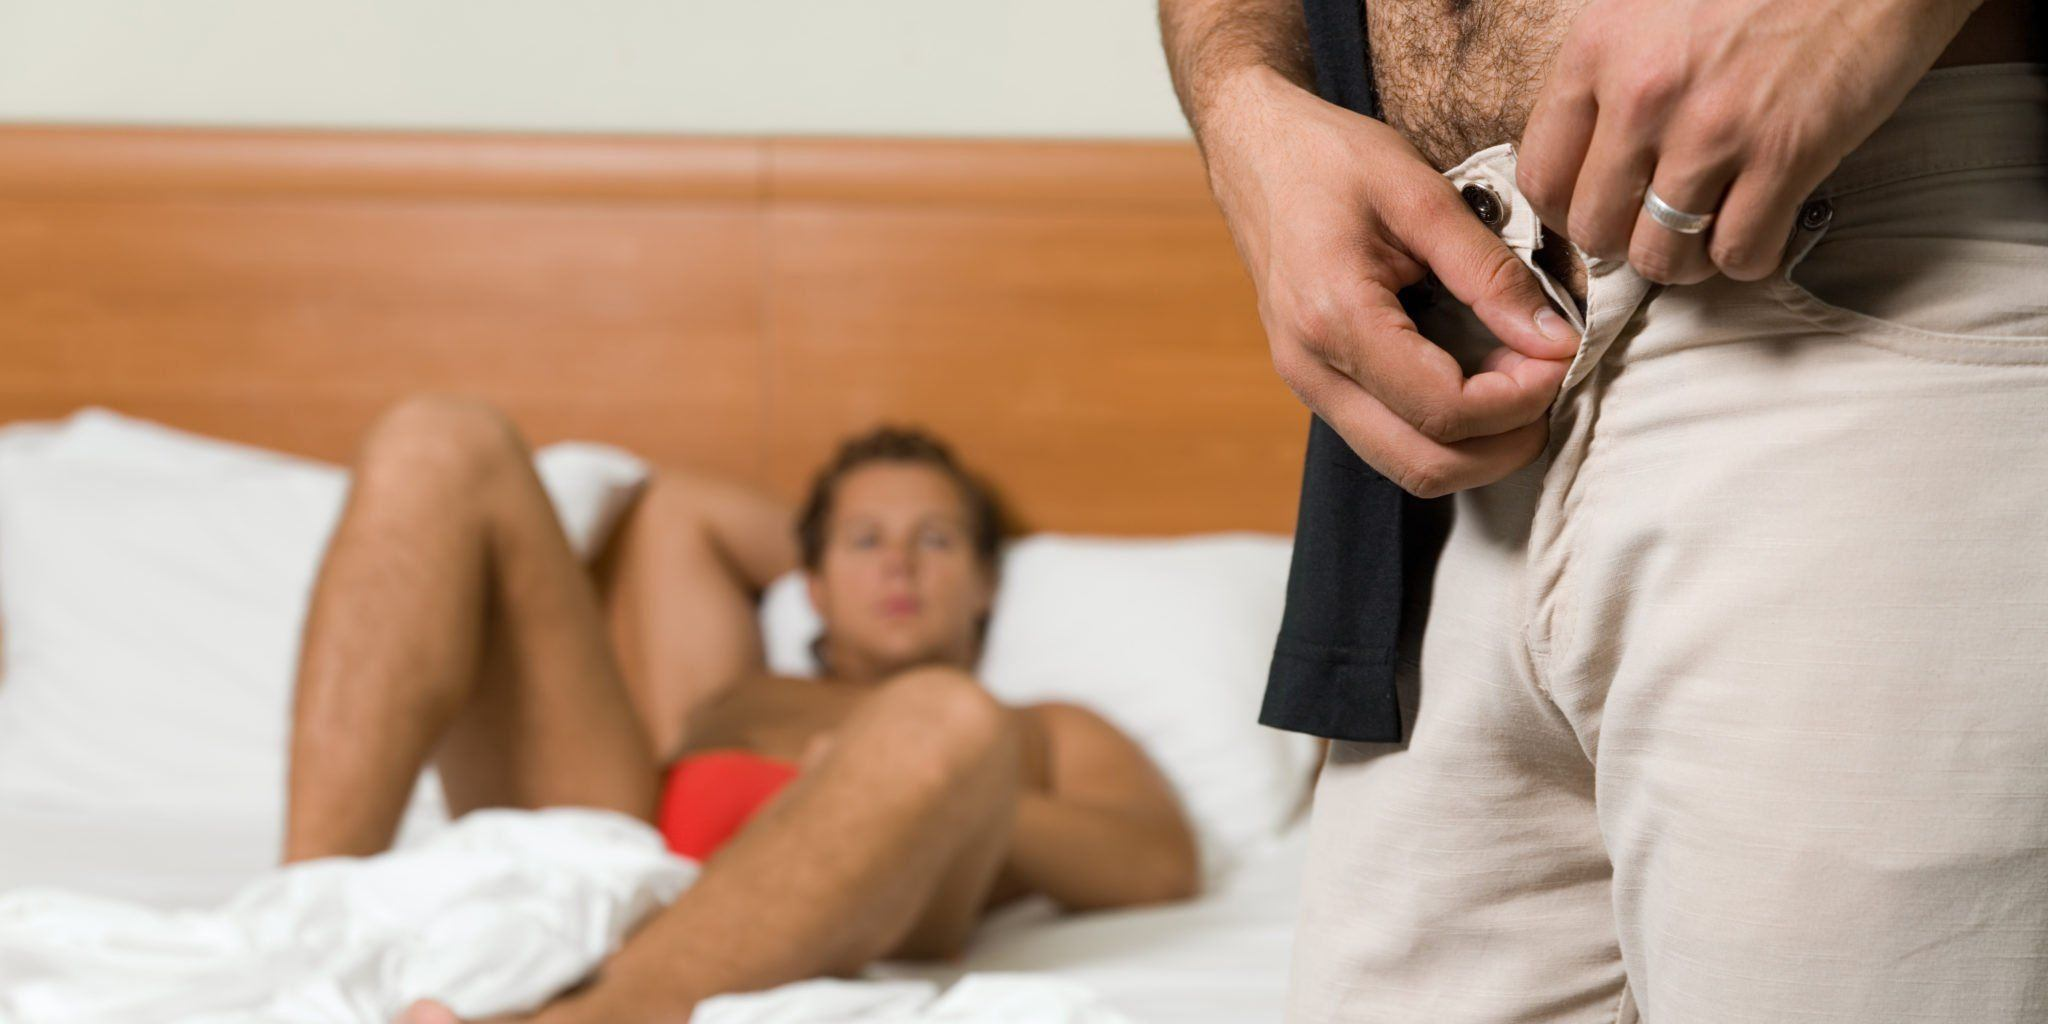 Free gay porn datebase